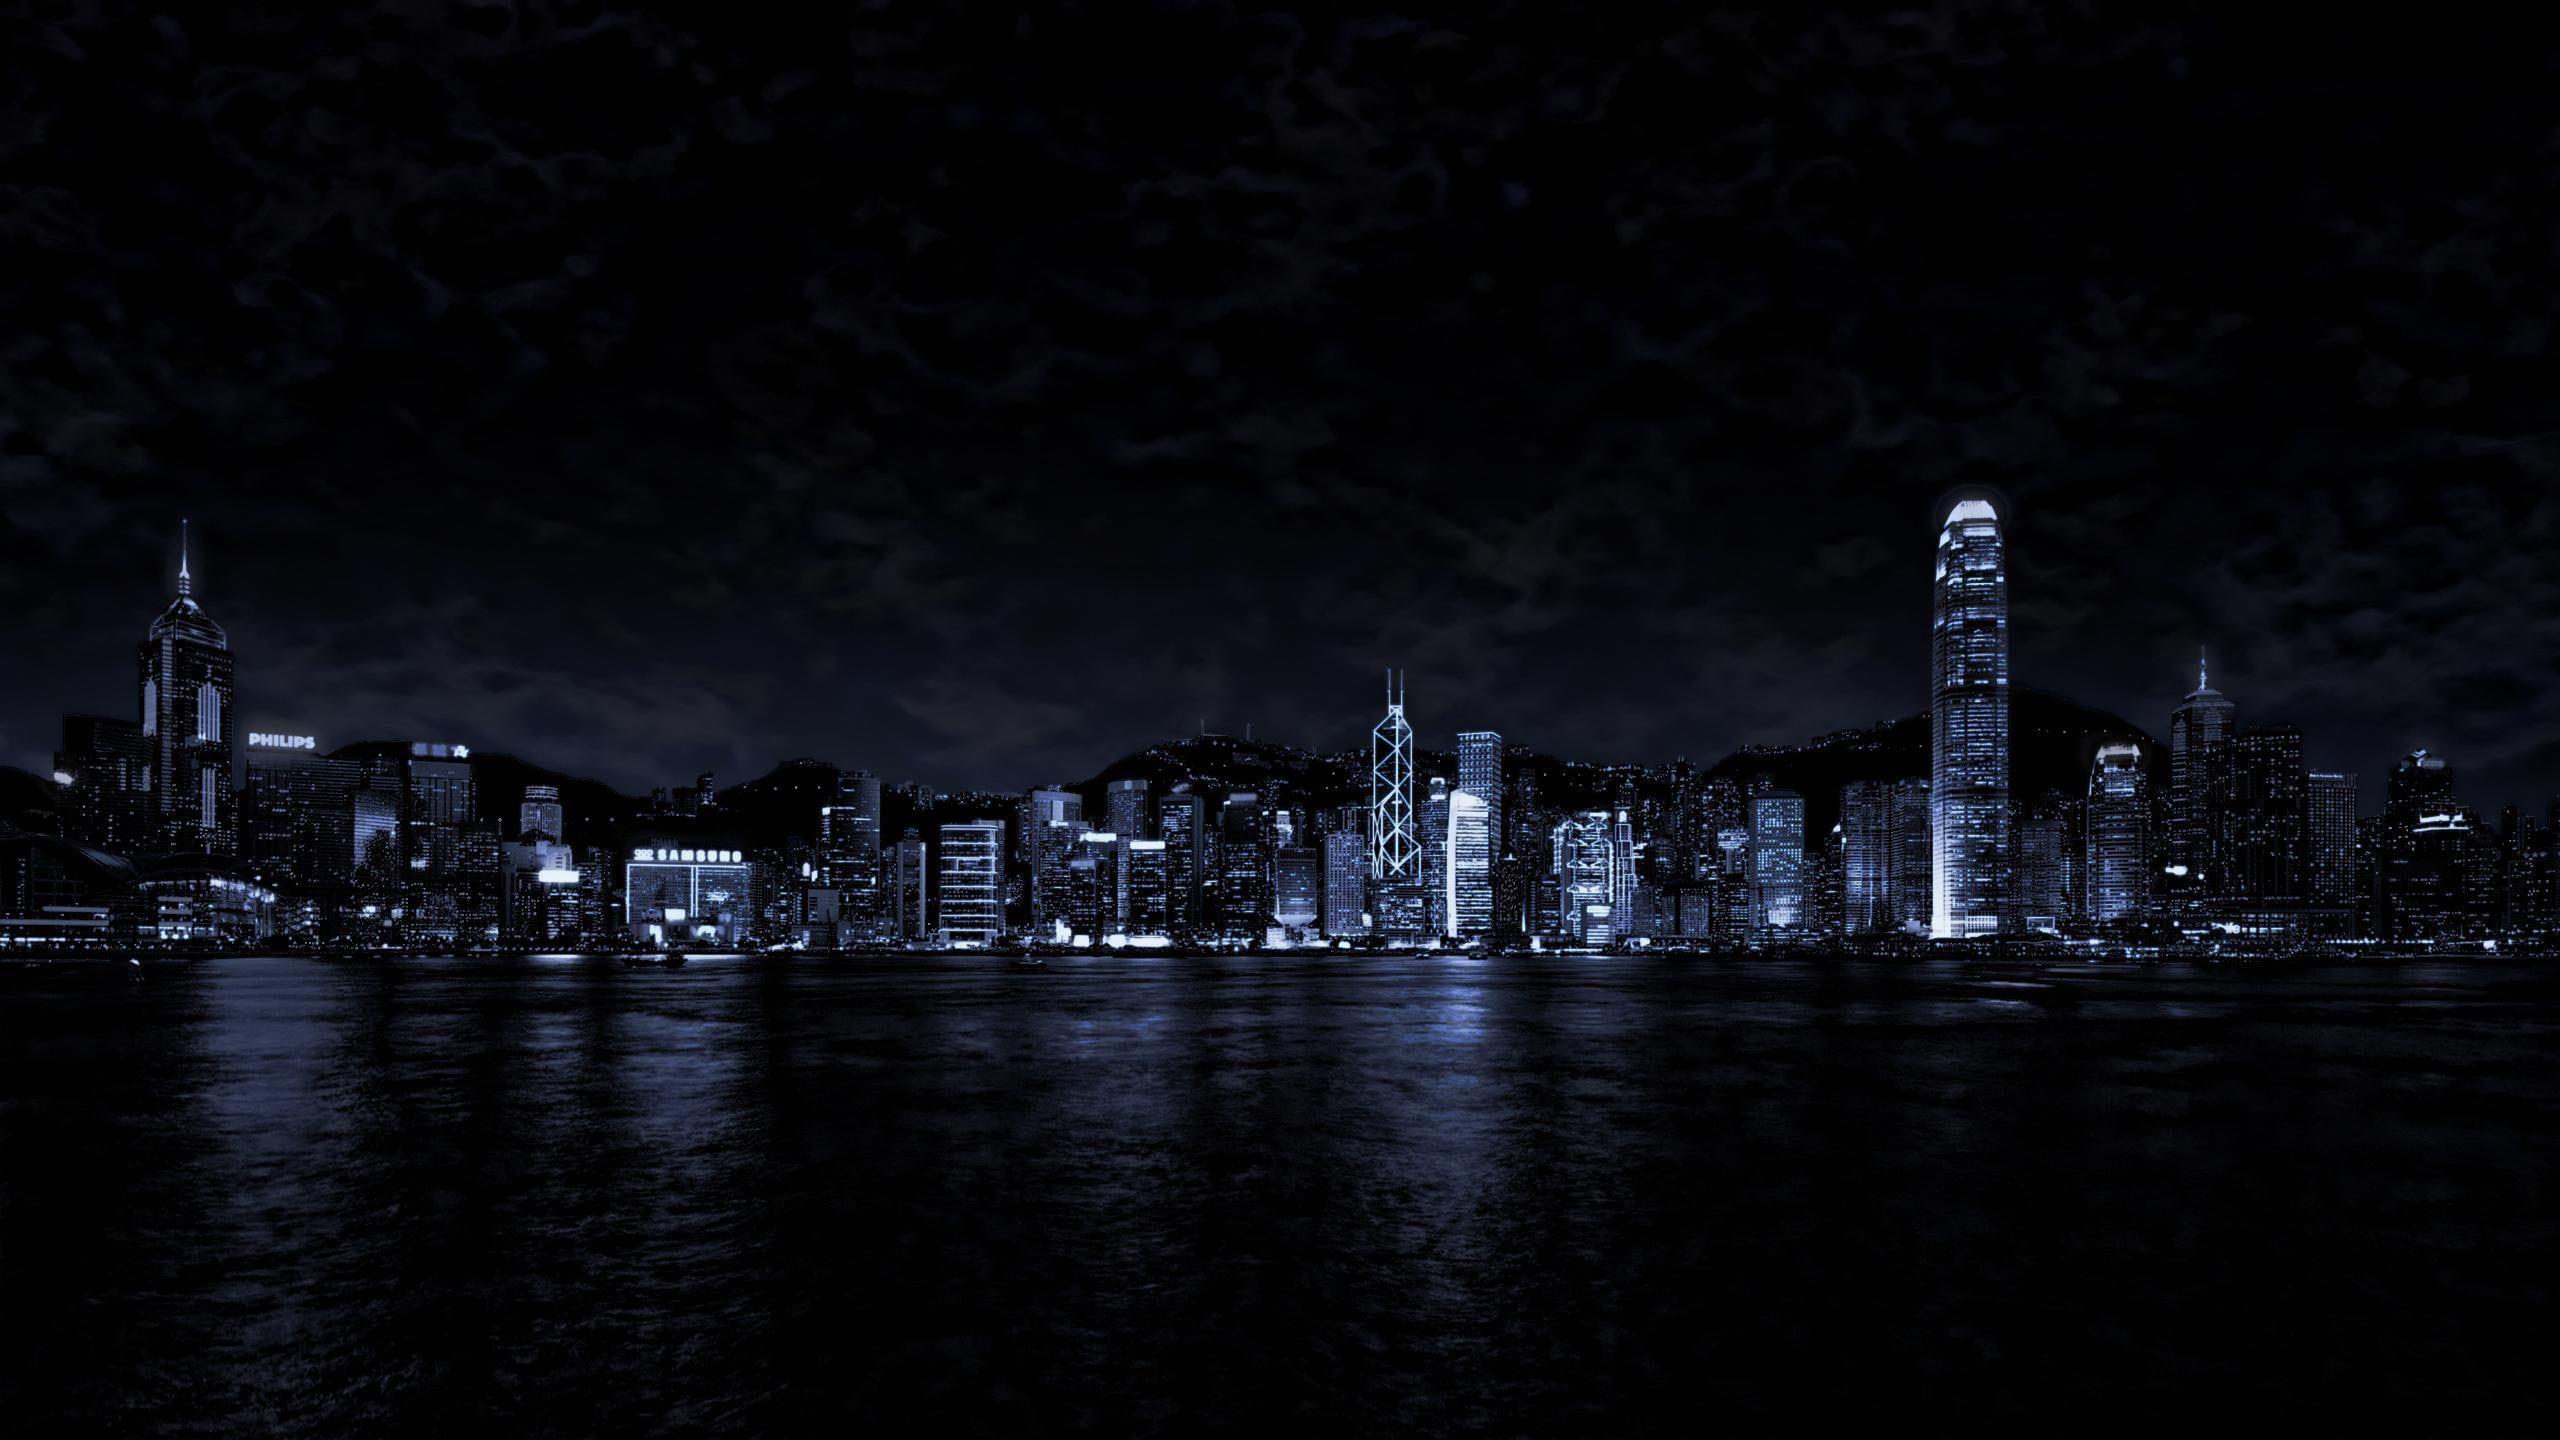 Dark Town Wallpapers Top Free Dark Town Backgrounds